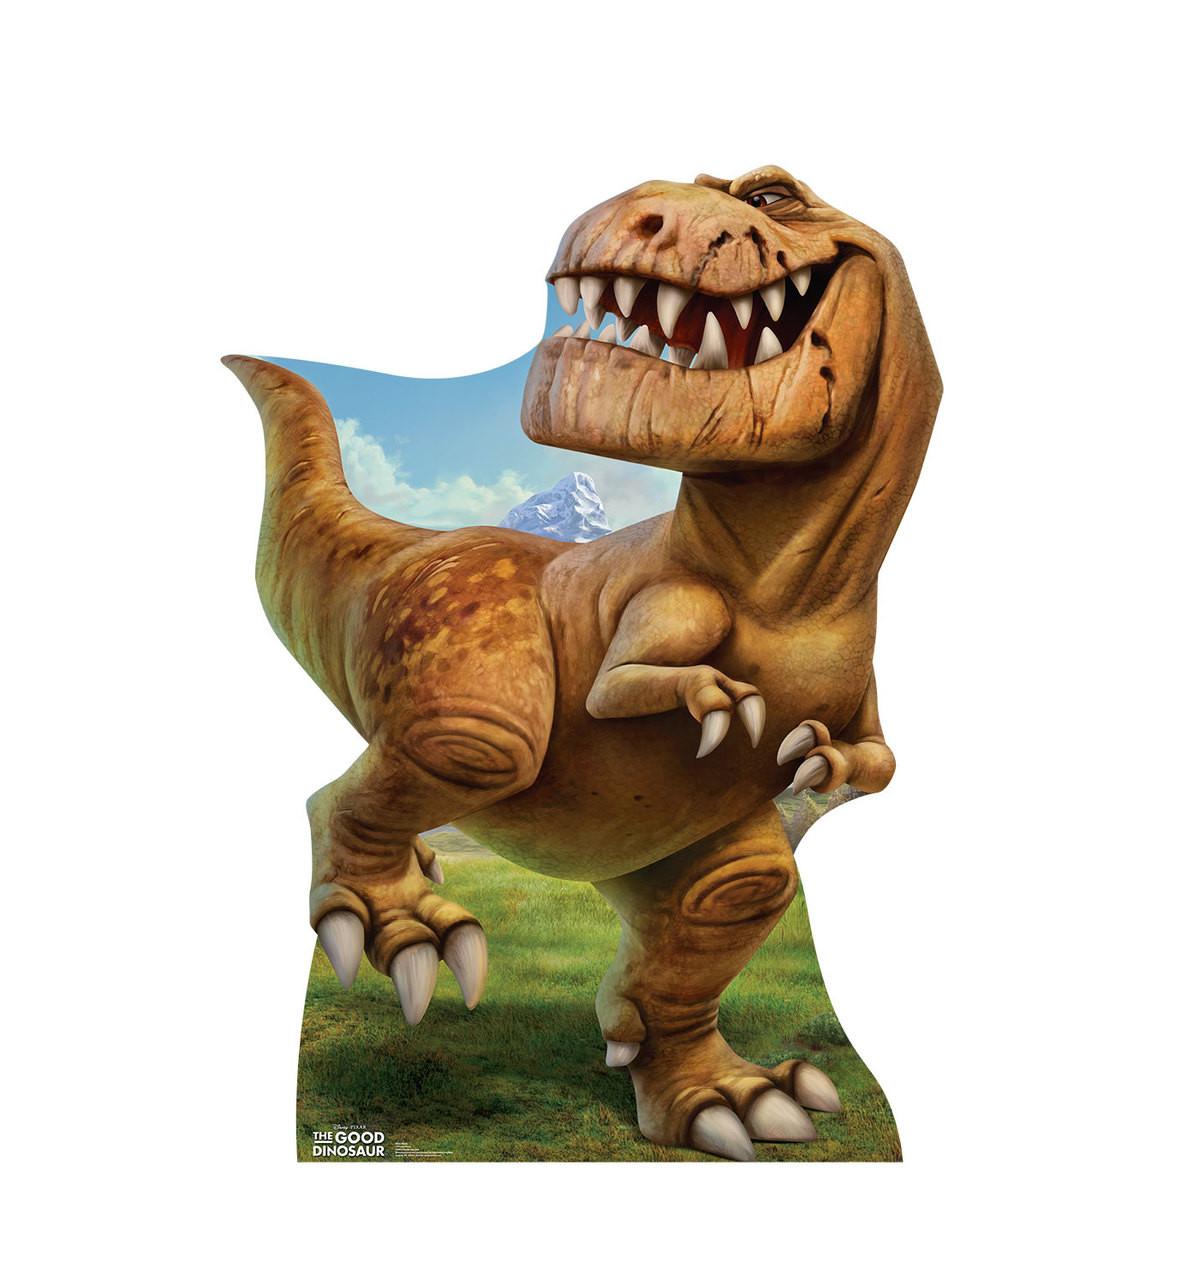 Butch - The Good Dinosaur-Cardboard Cutout 2052